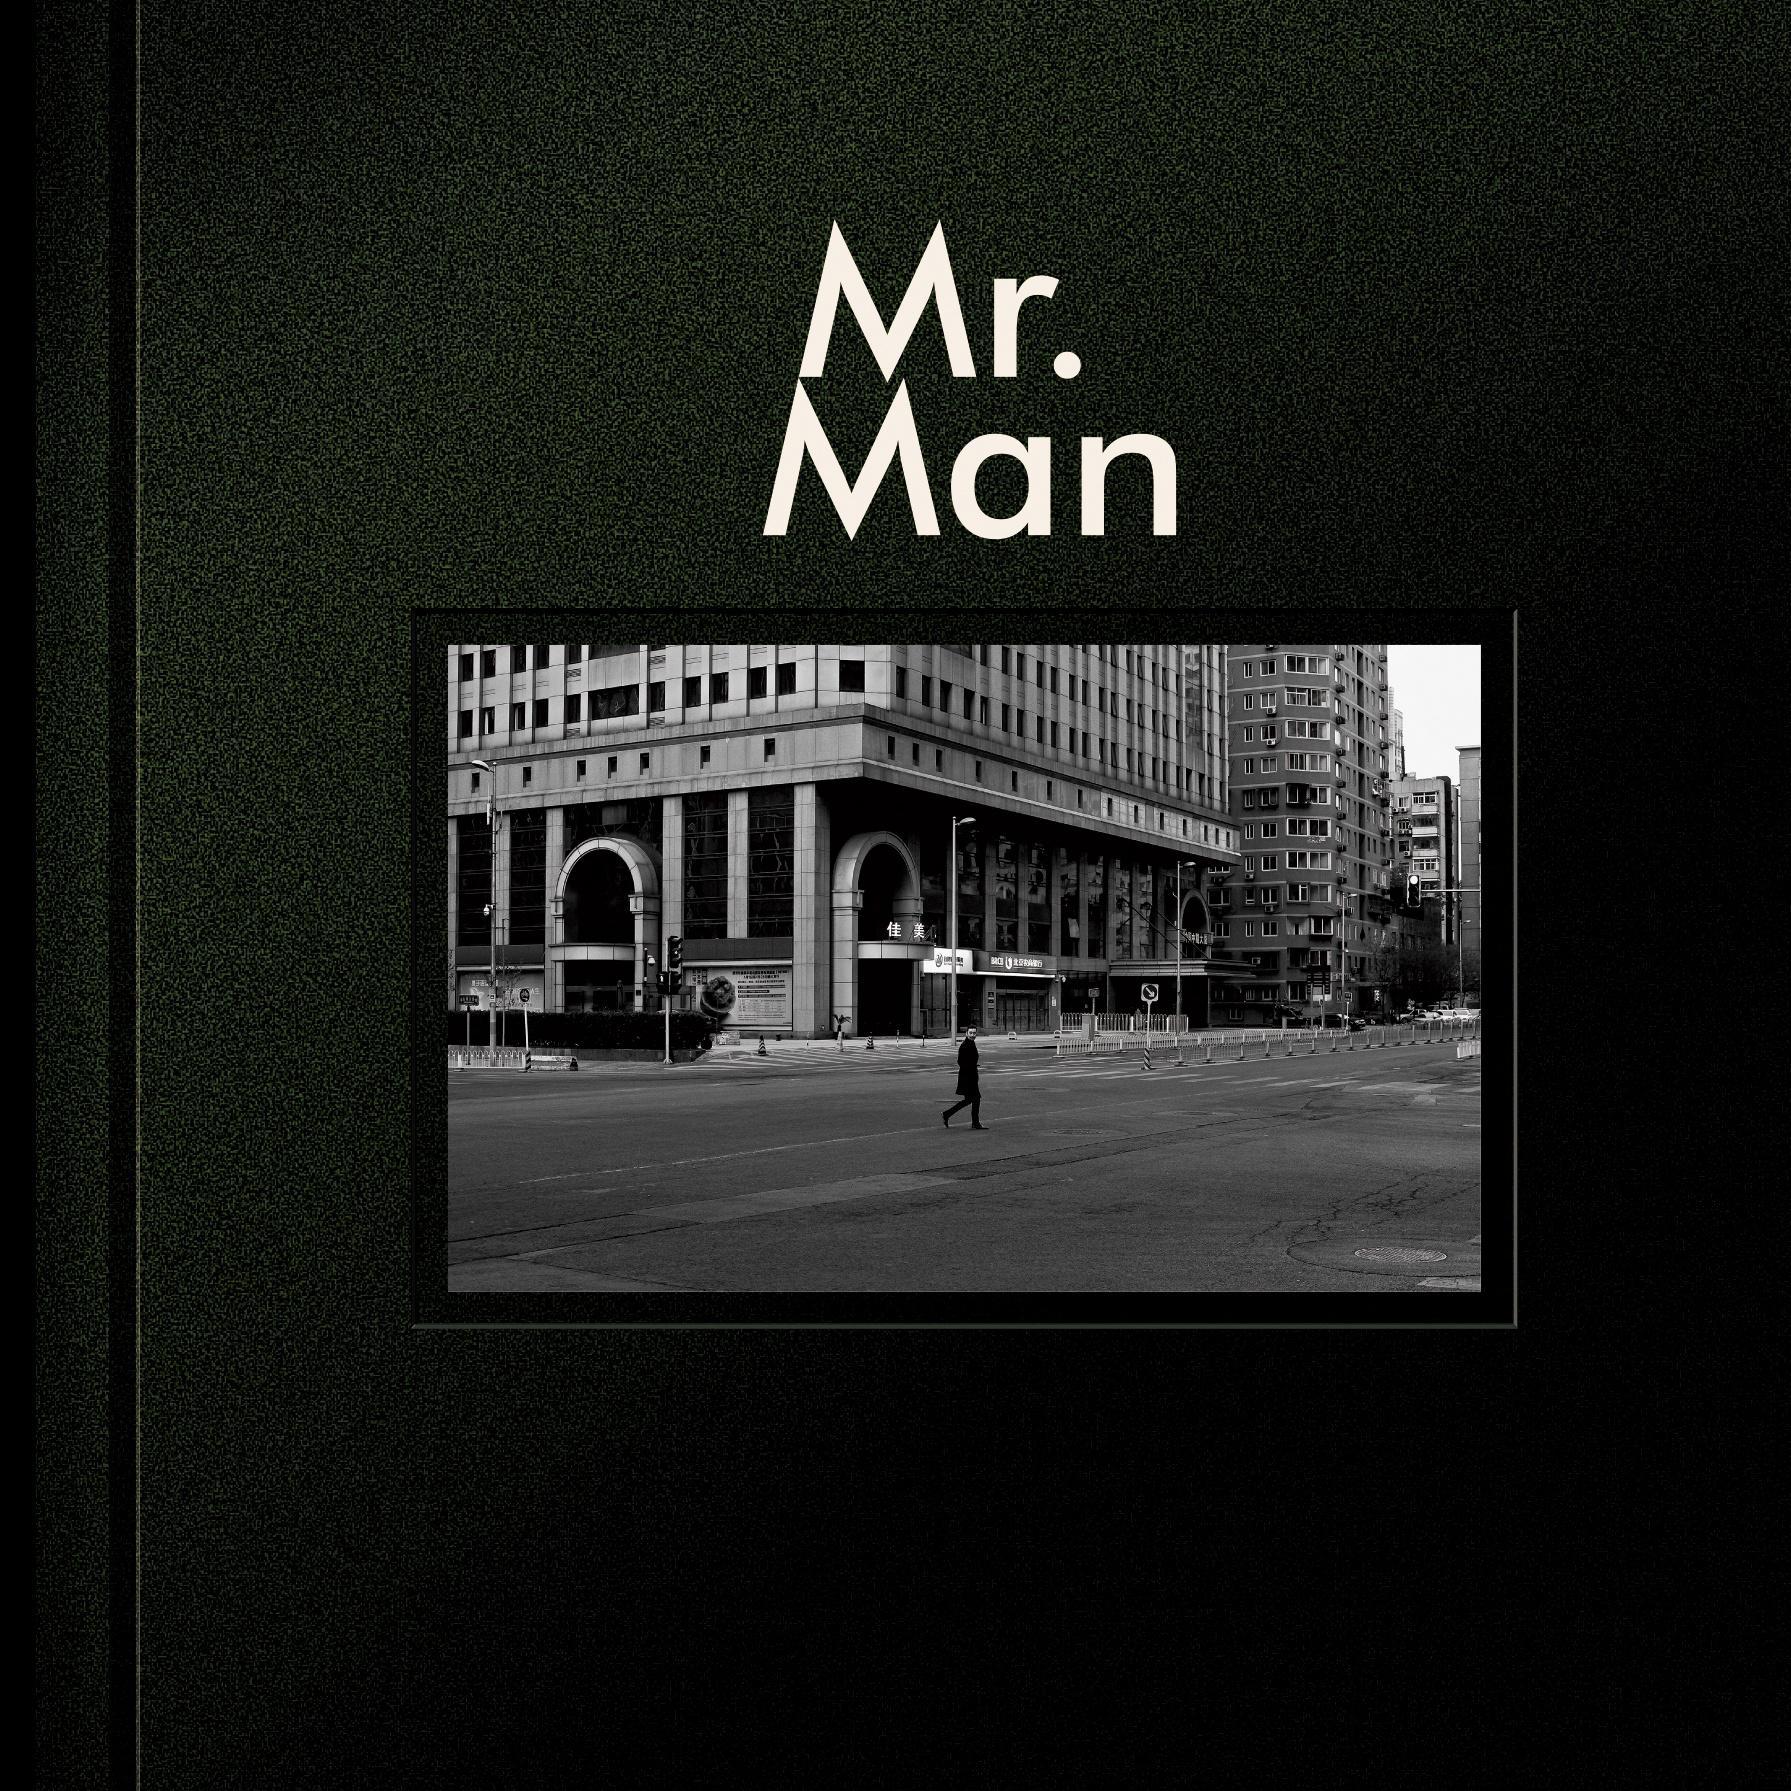 Mr.Man